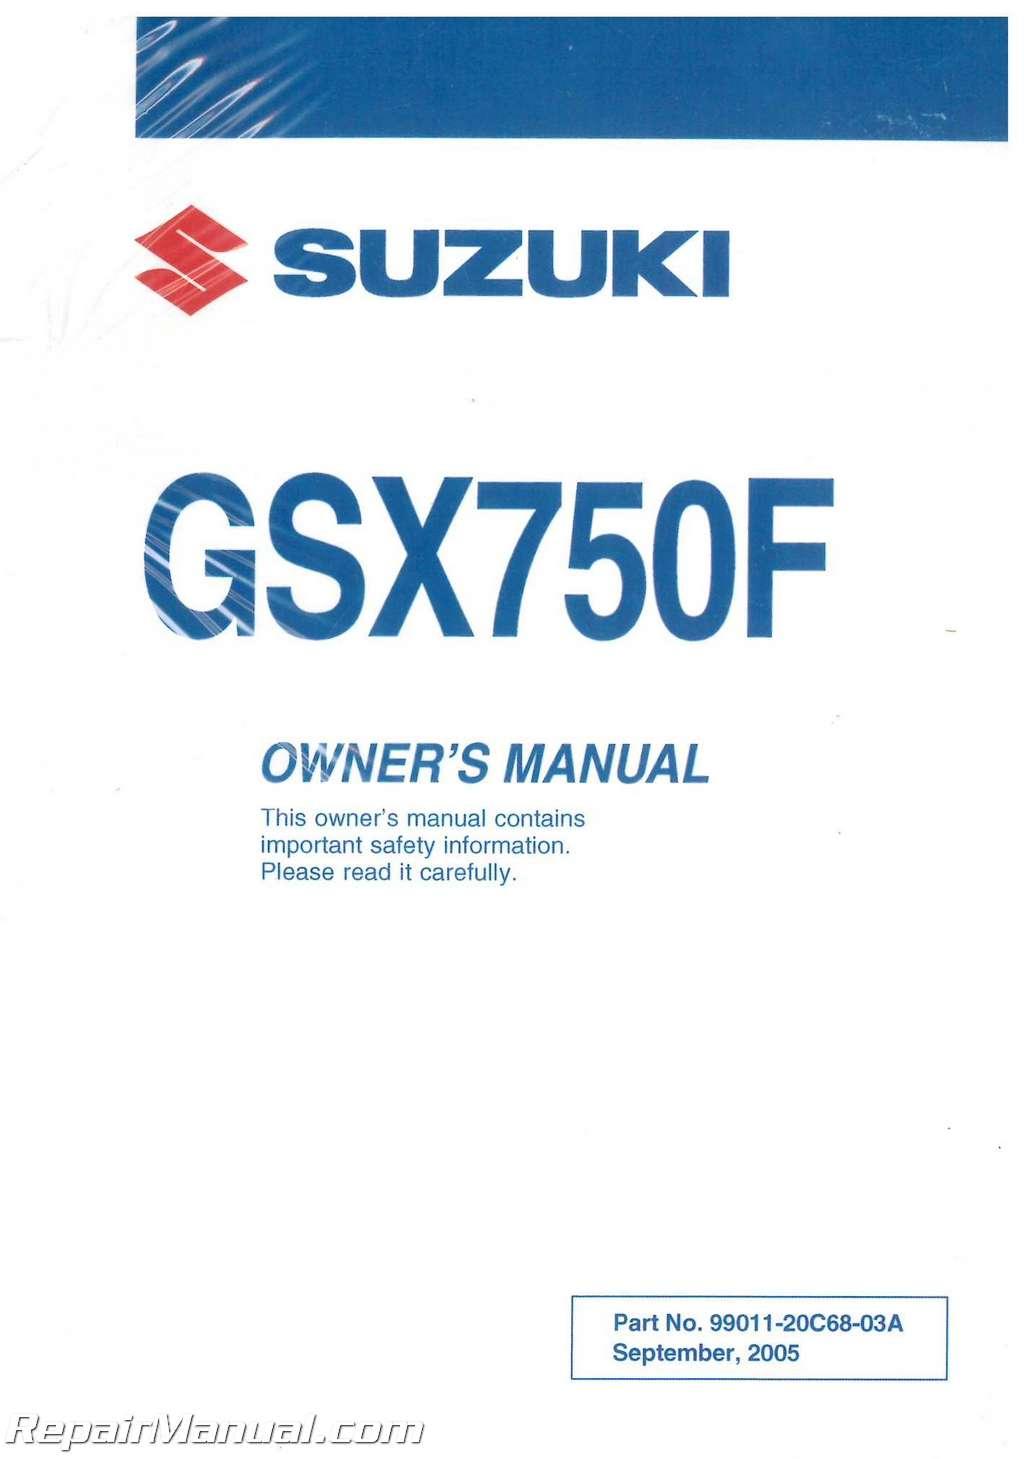 1992 Suzuki Katana 750 Owners Manual